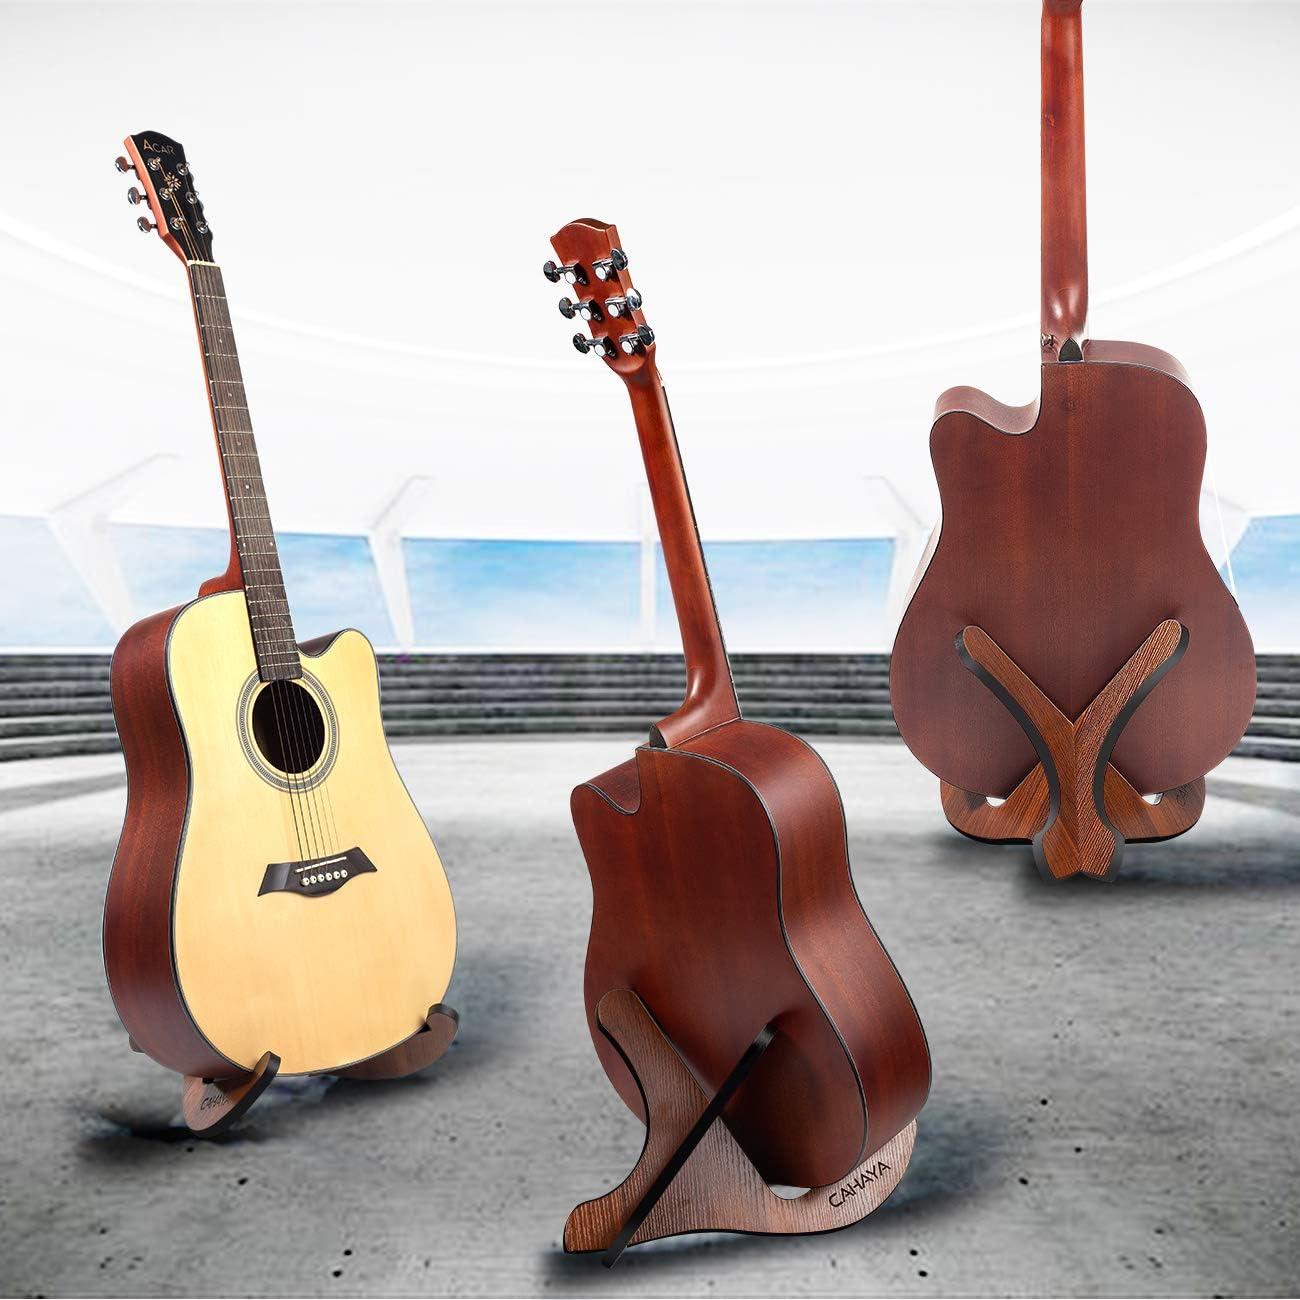 CAHAYA Guitar Stand Universal Wooden Guitar Stand